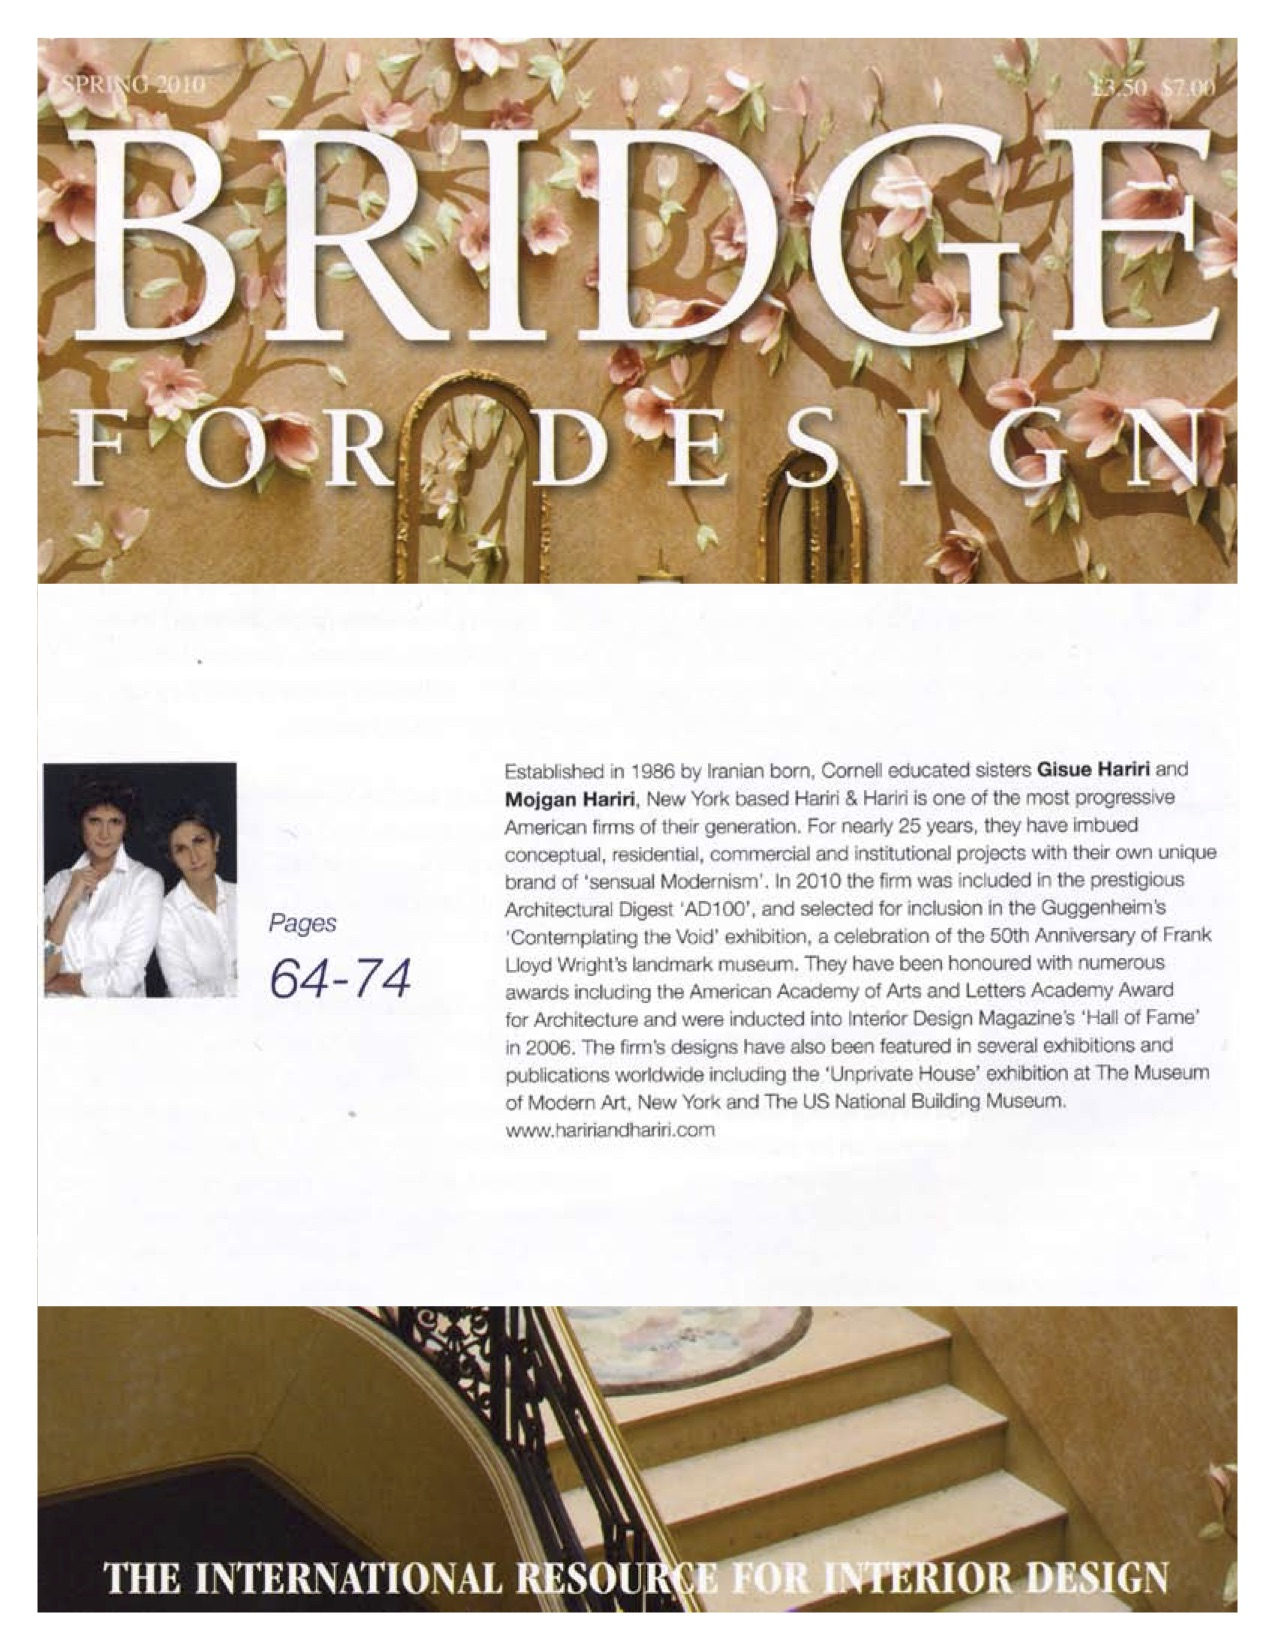 04.10 BRIDGE FOR DESIGN (PROFILE OF H&H)